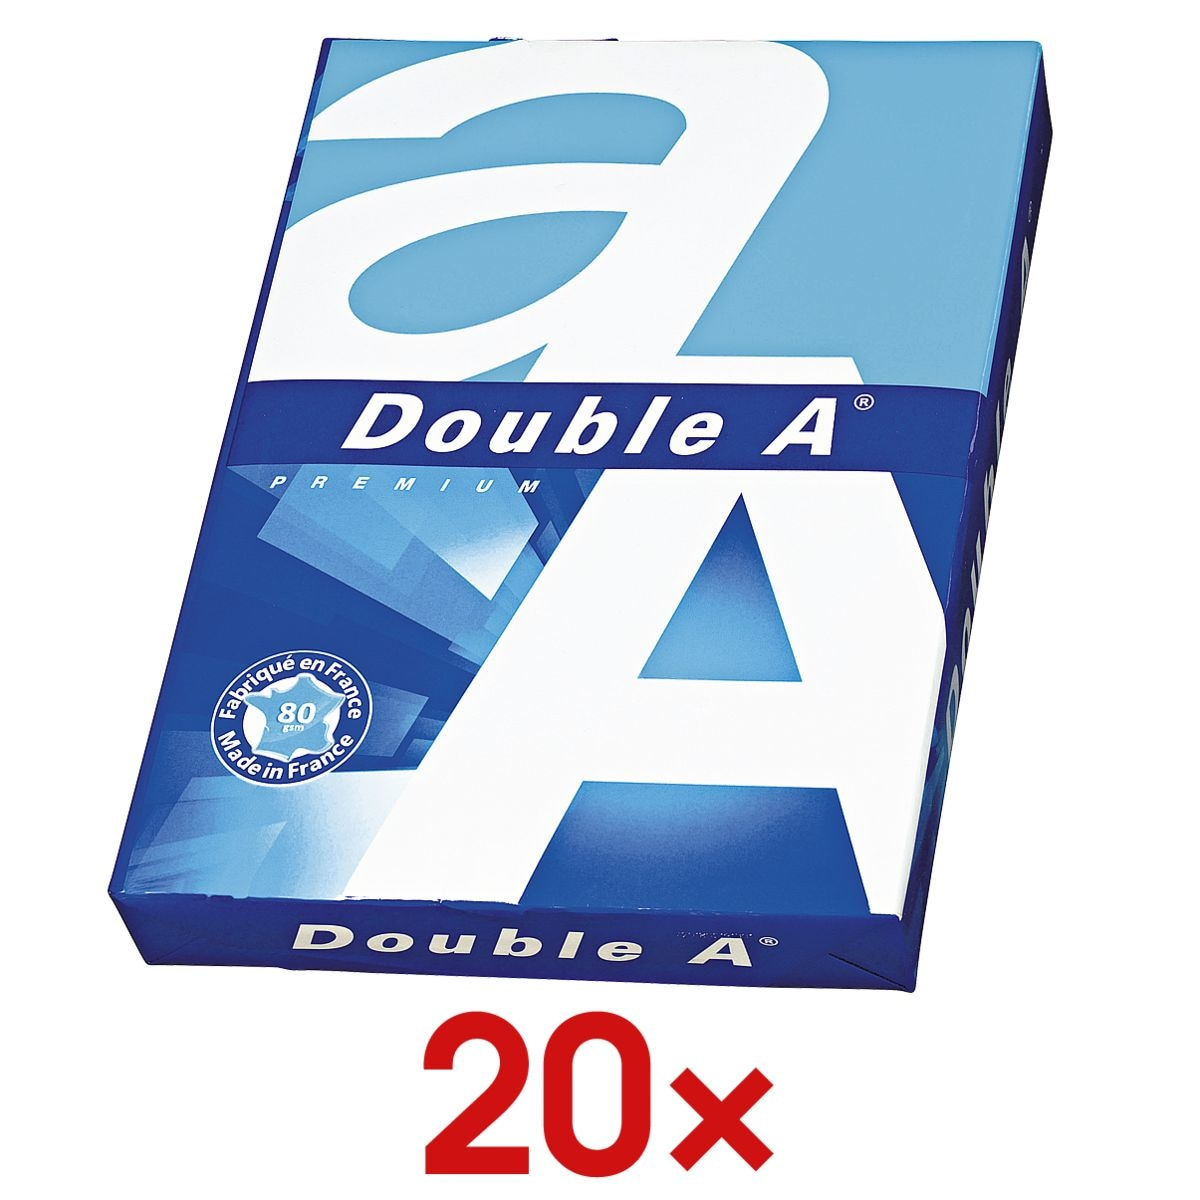 20x Multifunktionales Druckerpapier A4 Double A - 10000 Blatt gesamt, 80 g/m²